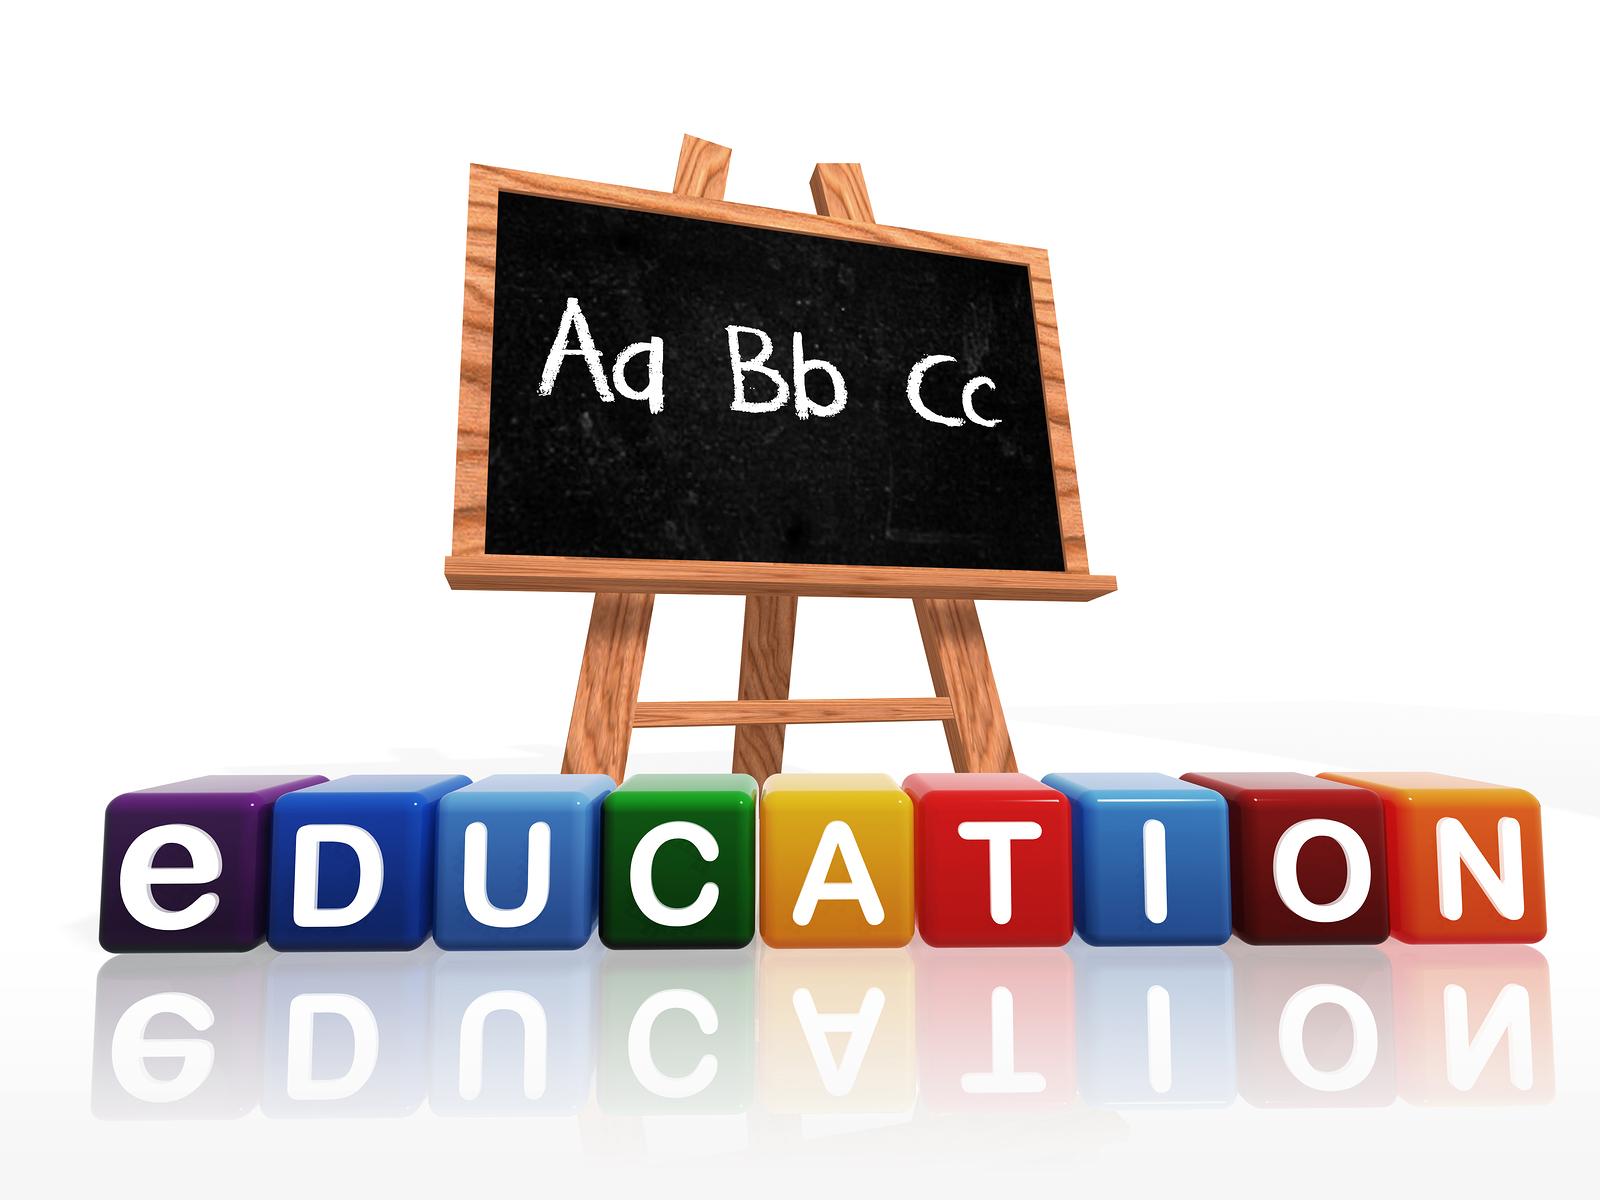 bigstock-Education-31579904.jpg